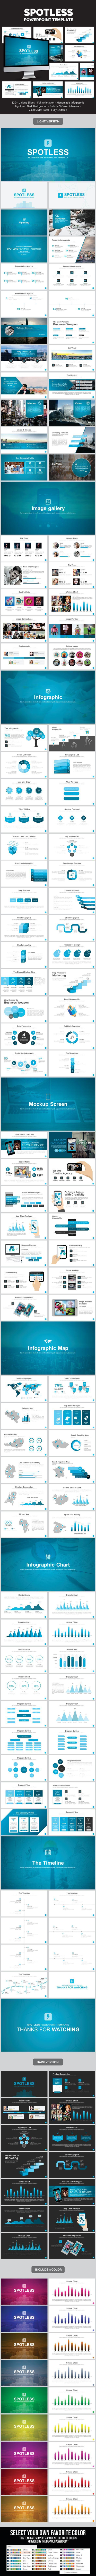 Spotless Presentation Template #powerpoint #presentation Download : https://graphicriver.net/item/spotless-presentation-template/13215178?s_rank=11?ref=BrandEarth